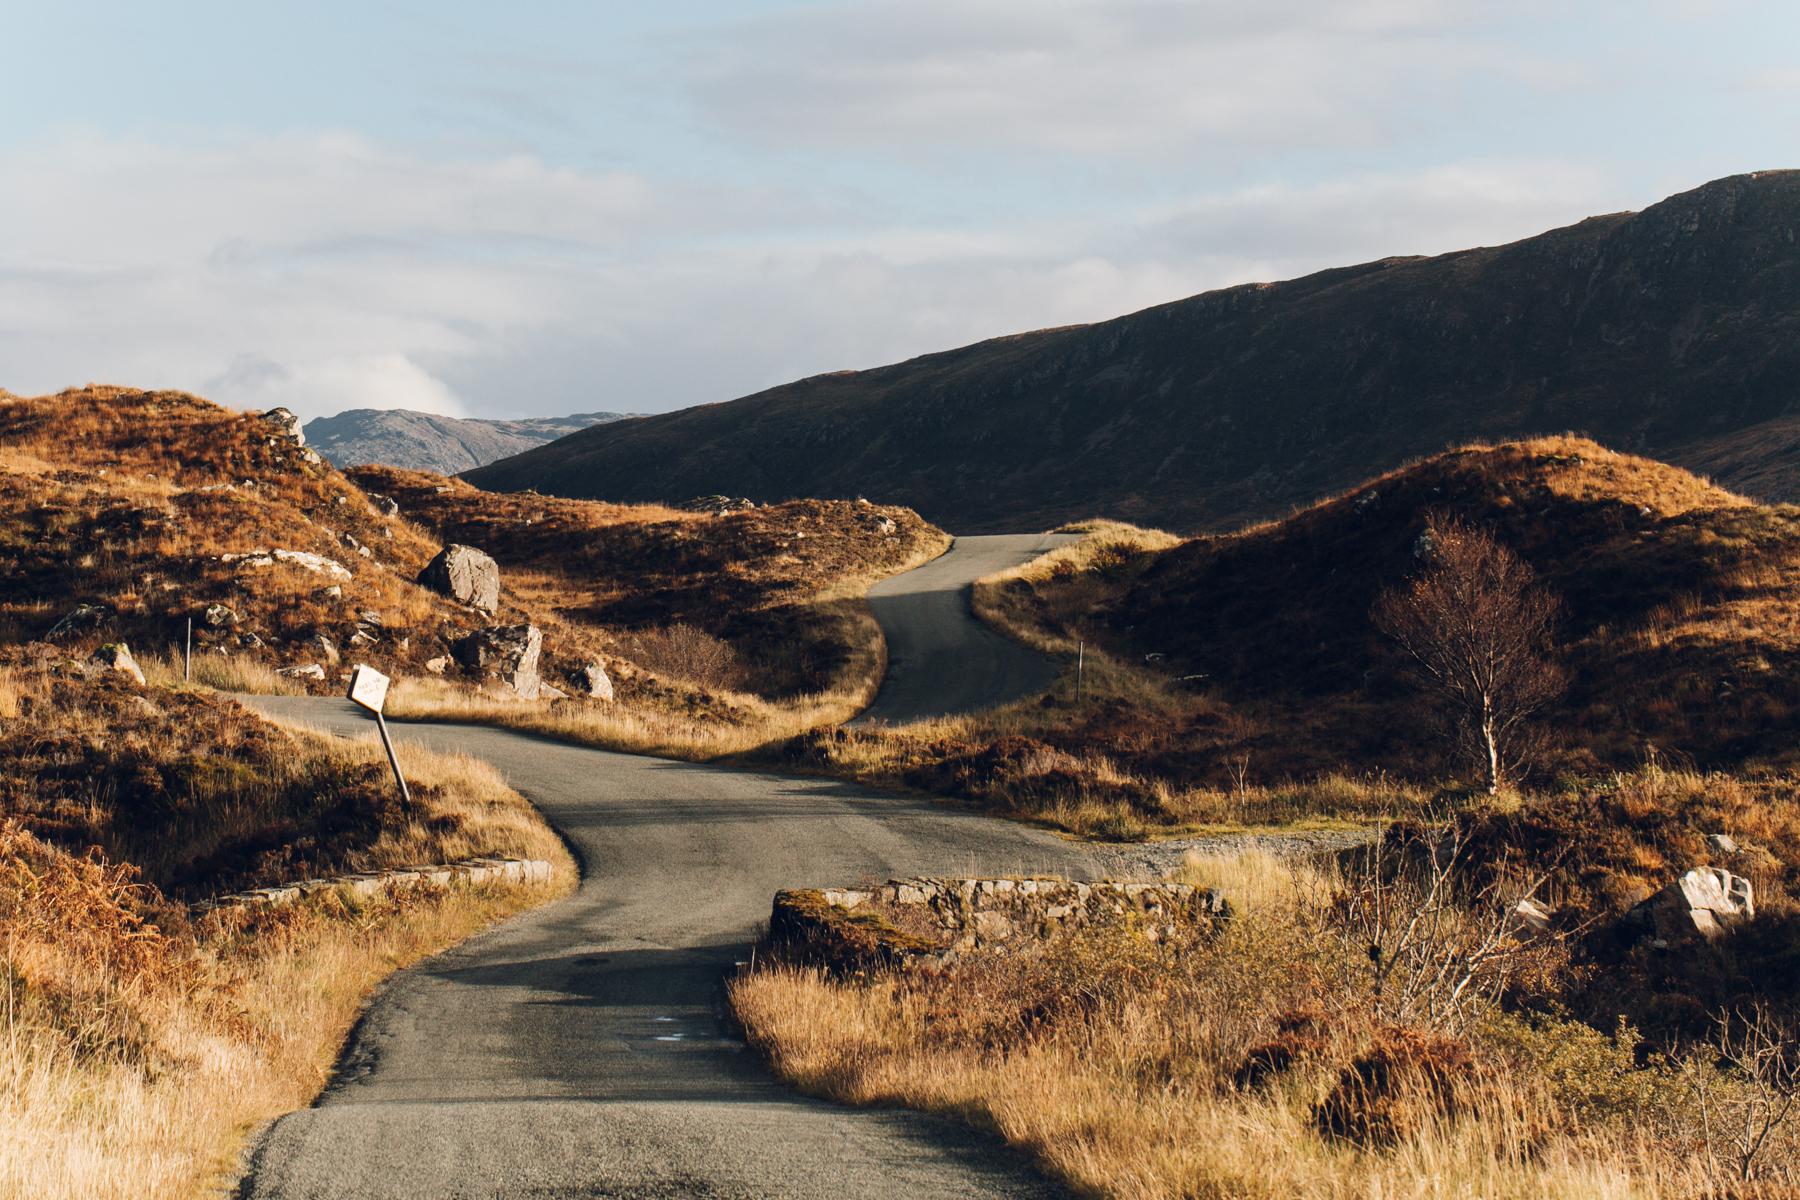 Winding roads on the Isle of Skye in Scotland.